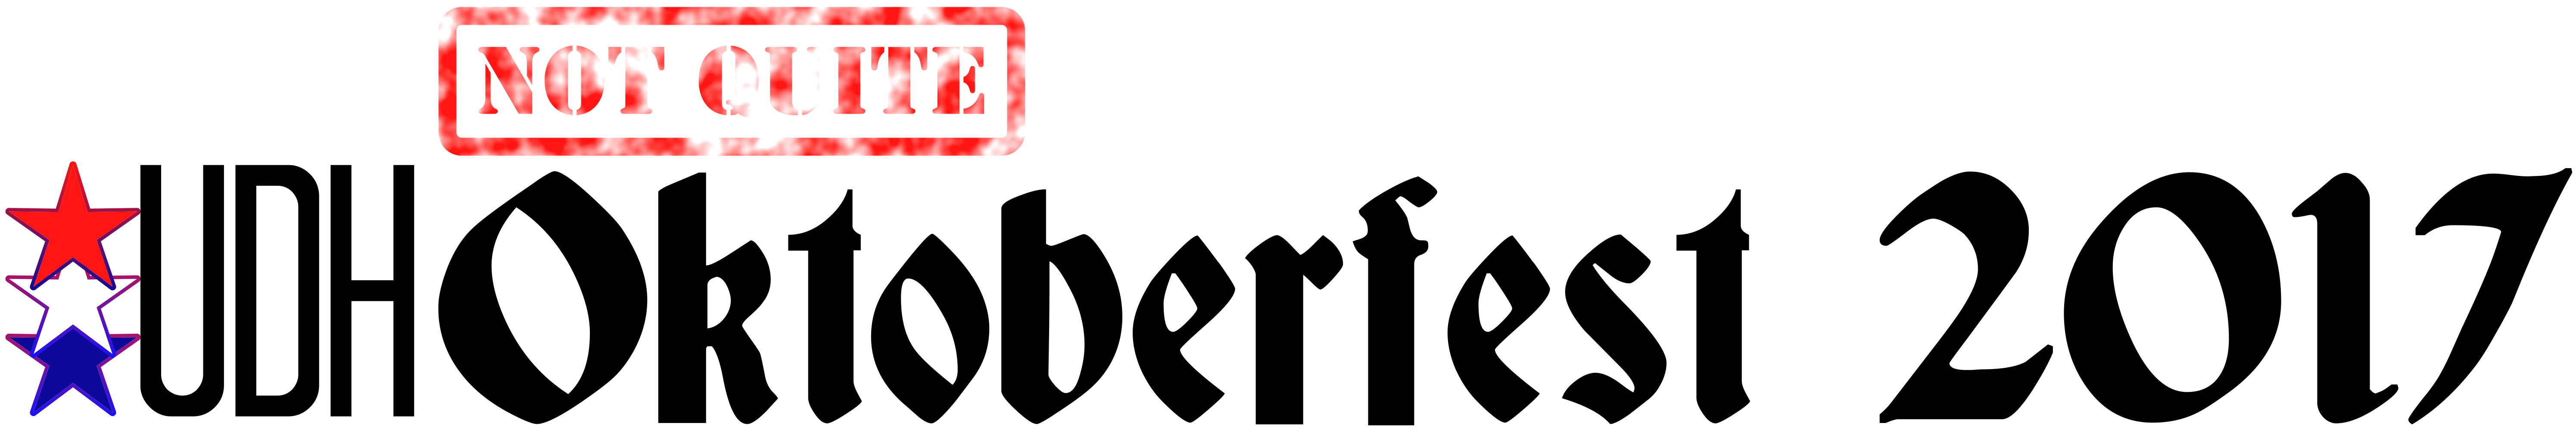 UDH_Oktoberfest_Logo_2017_1.png